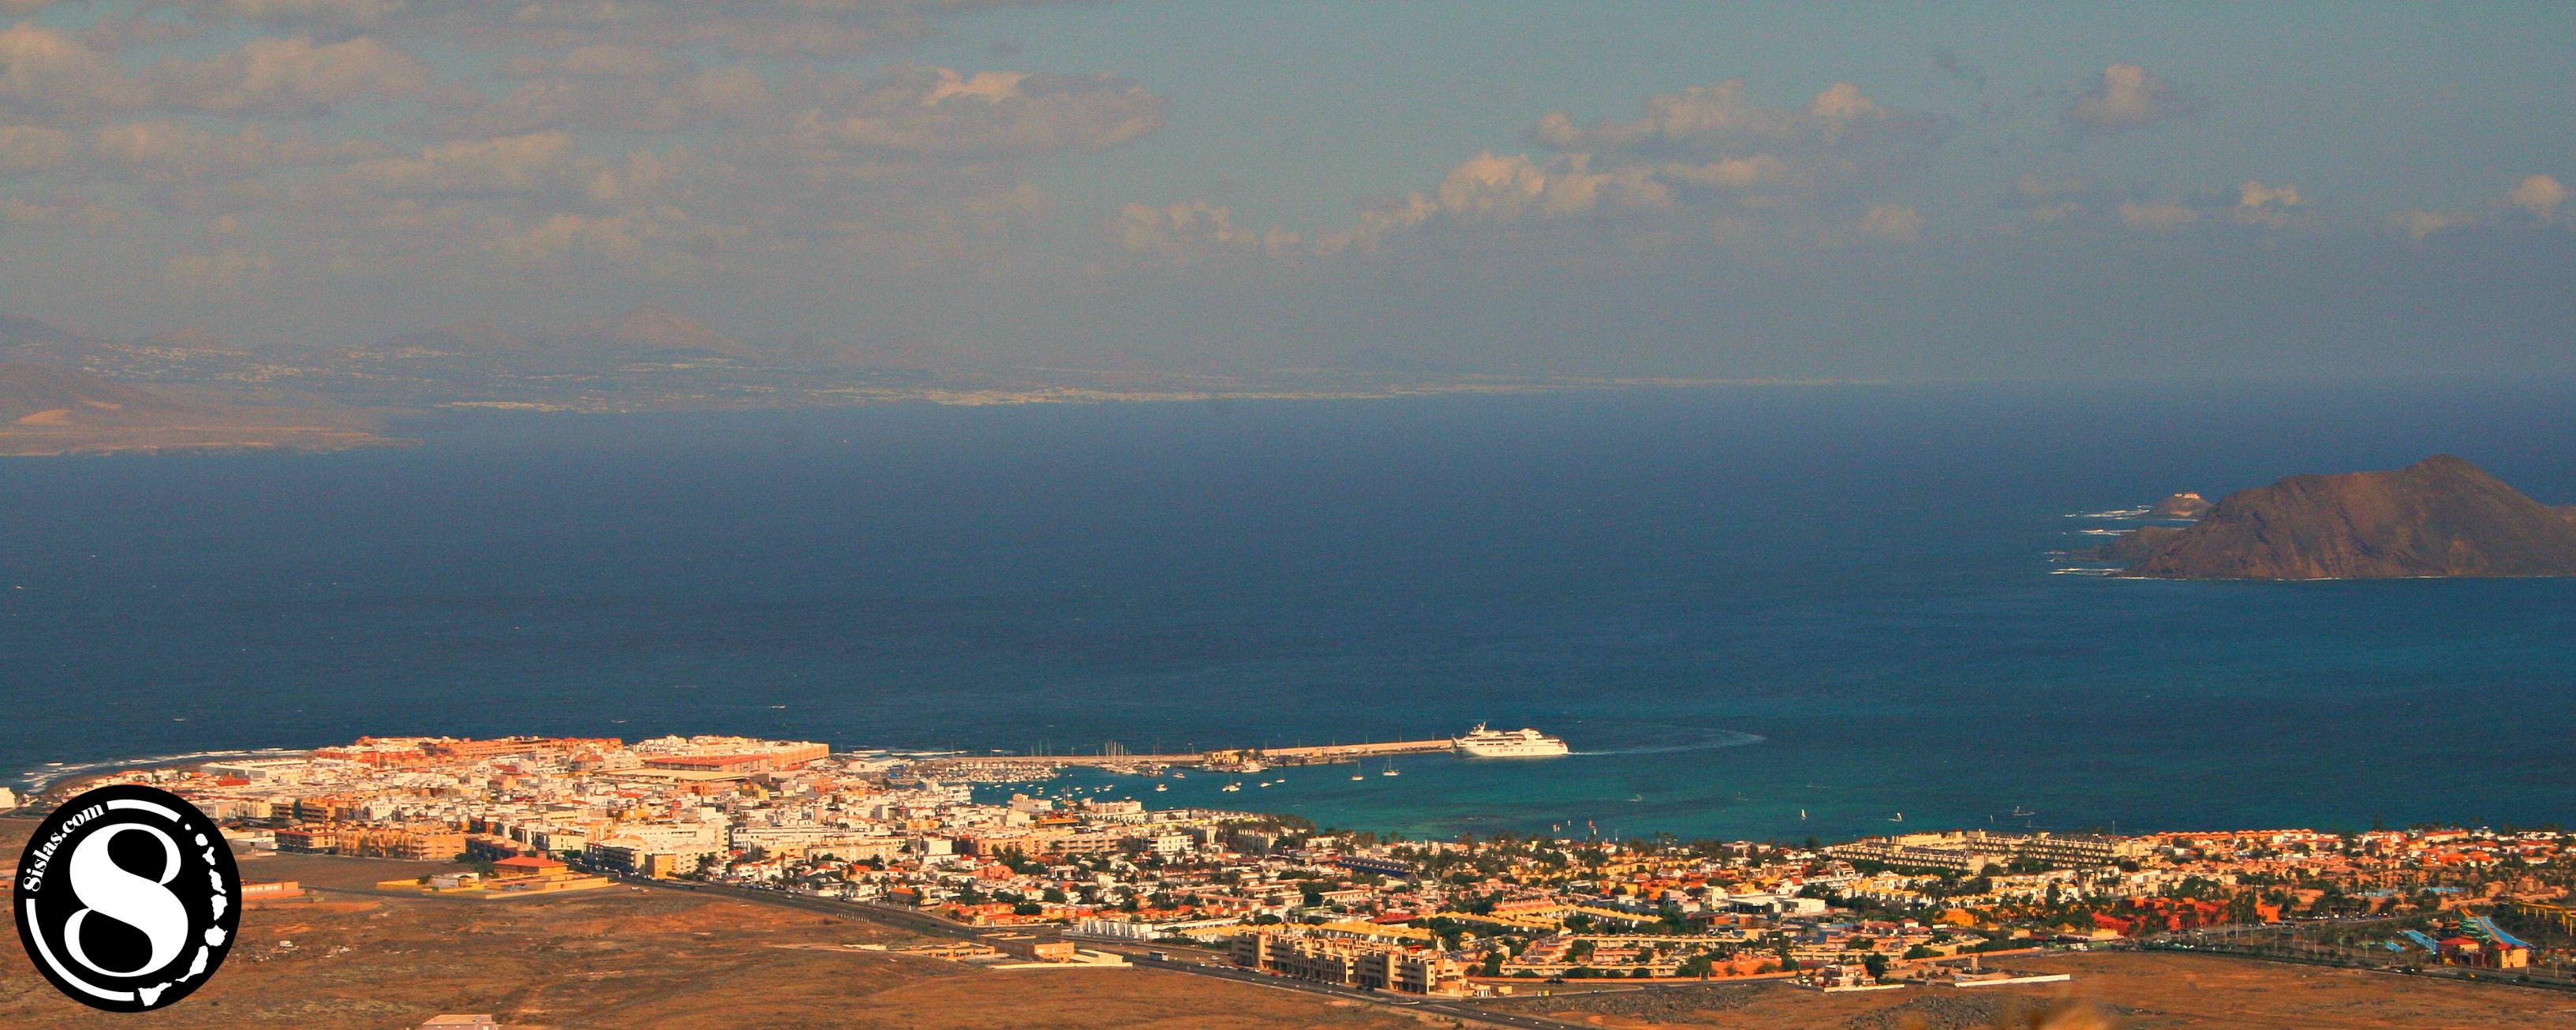 Corralejo,Fuerteventura